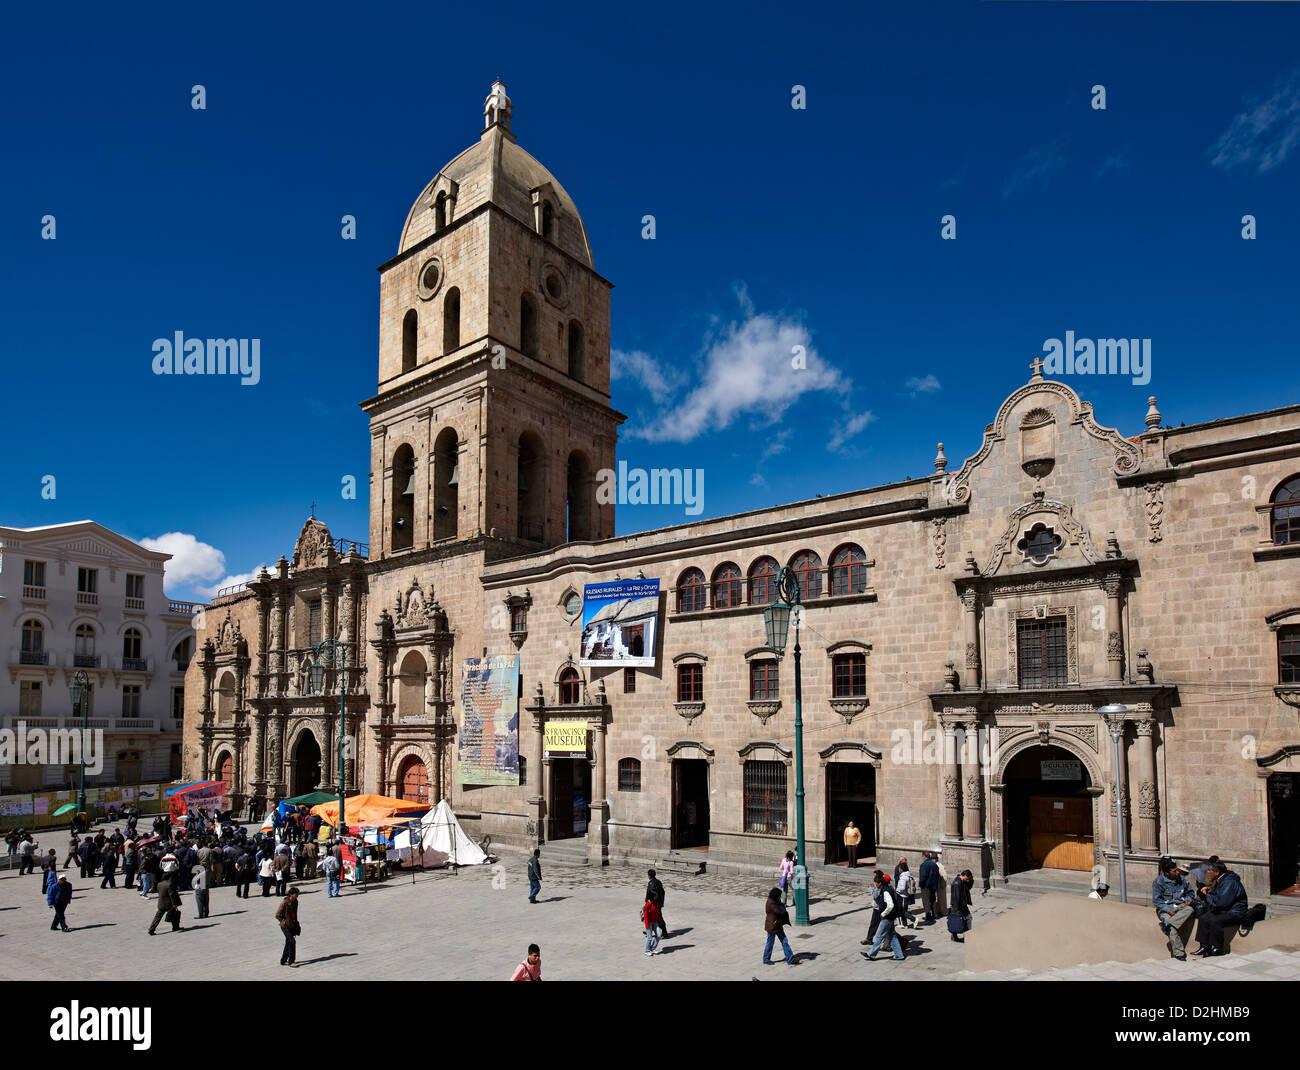 San Francisco Church, founded in 1548 and rebuilt 1784, Iglesia de San  Francisco and plaza, La Paz, Bolivia, South America